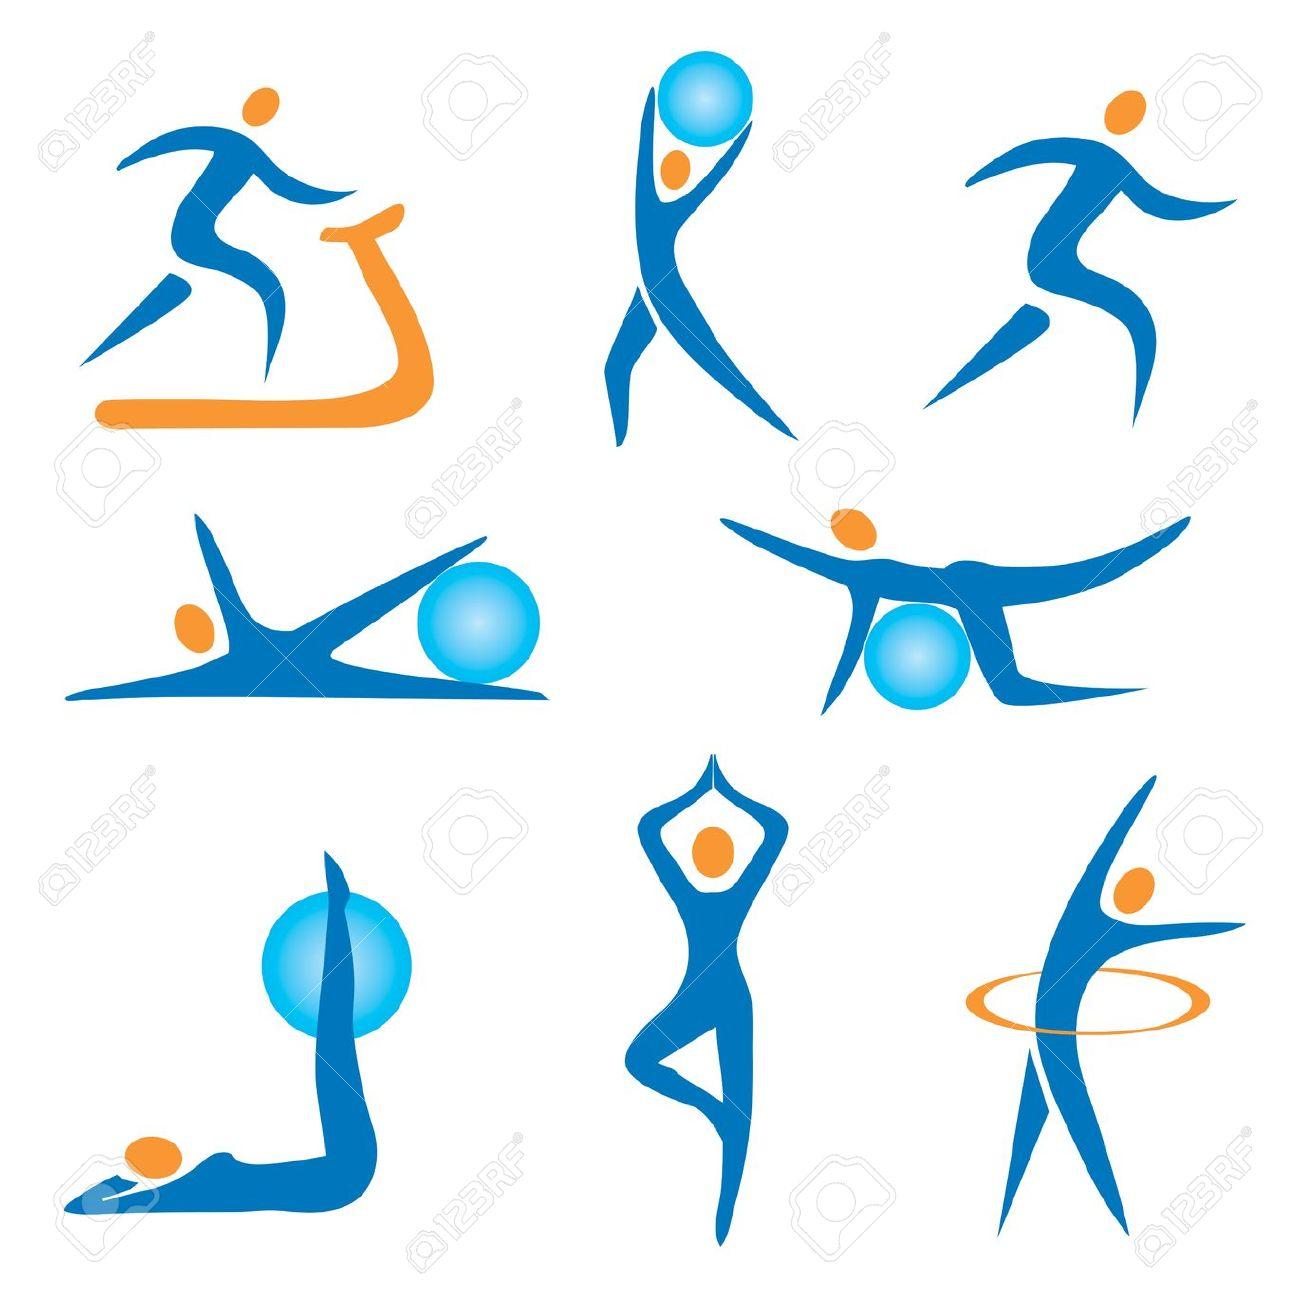 Bewegung und sport clipart. Set aus fitness bunten